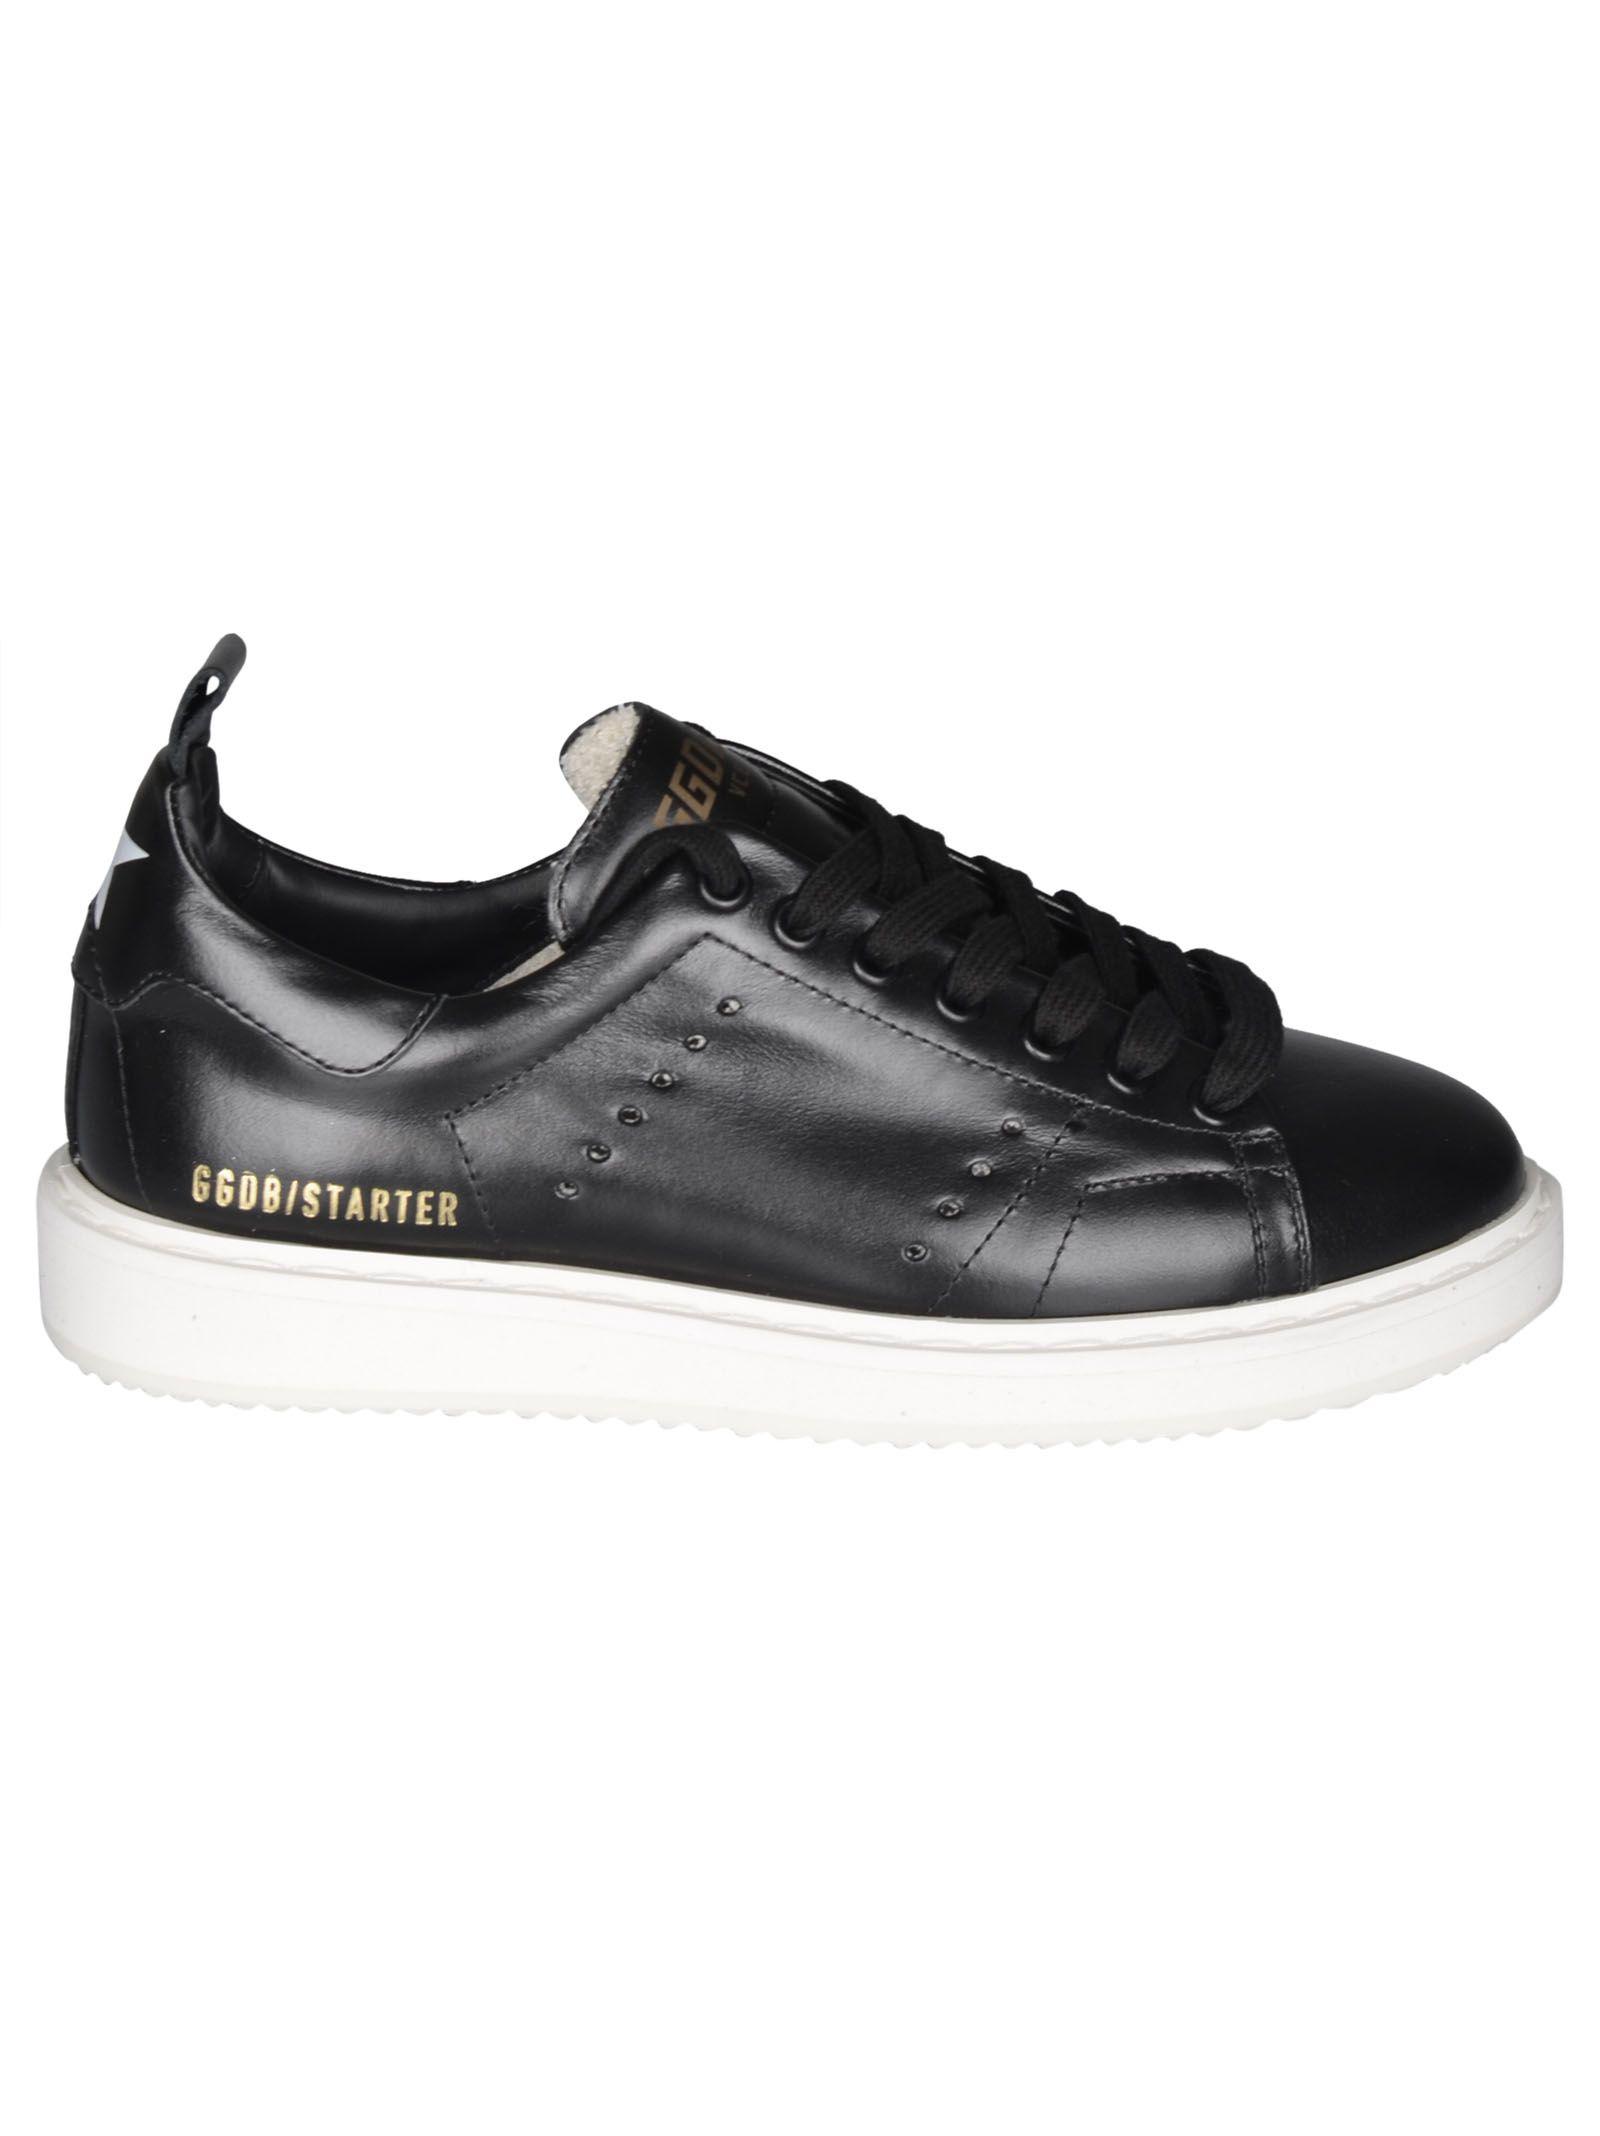 Starter Sneakers, Black Brushed Off